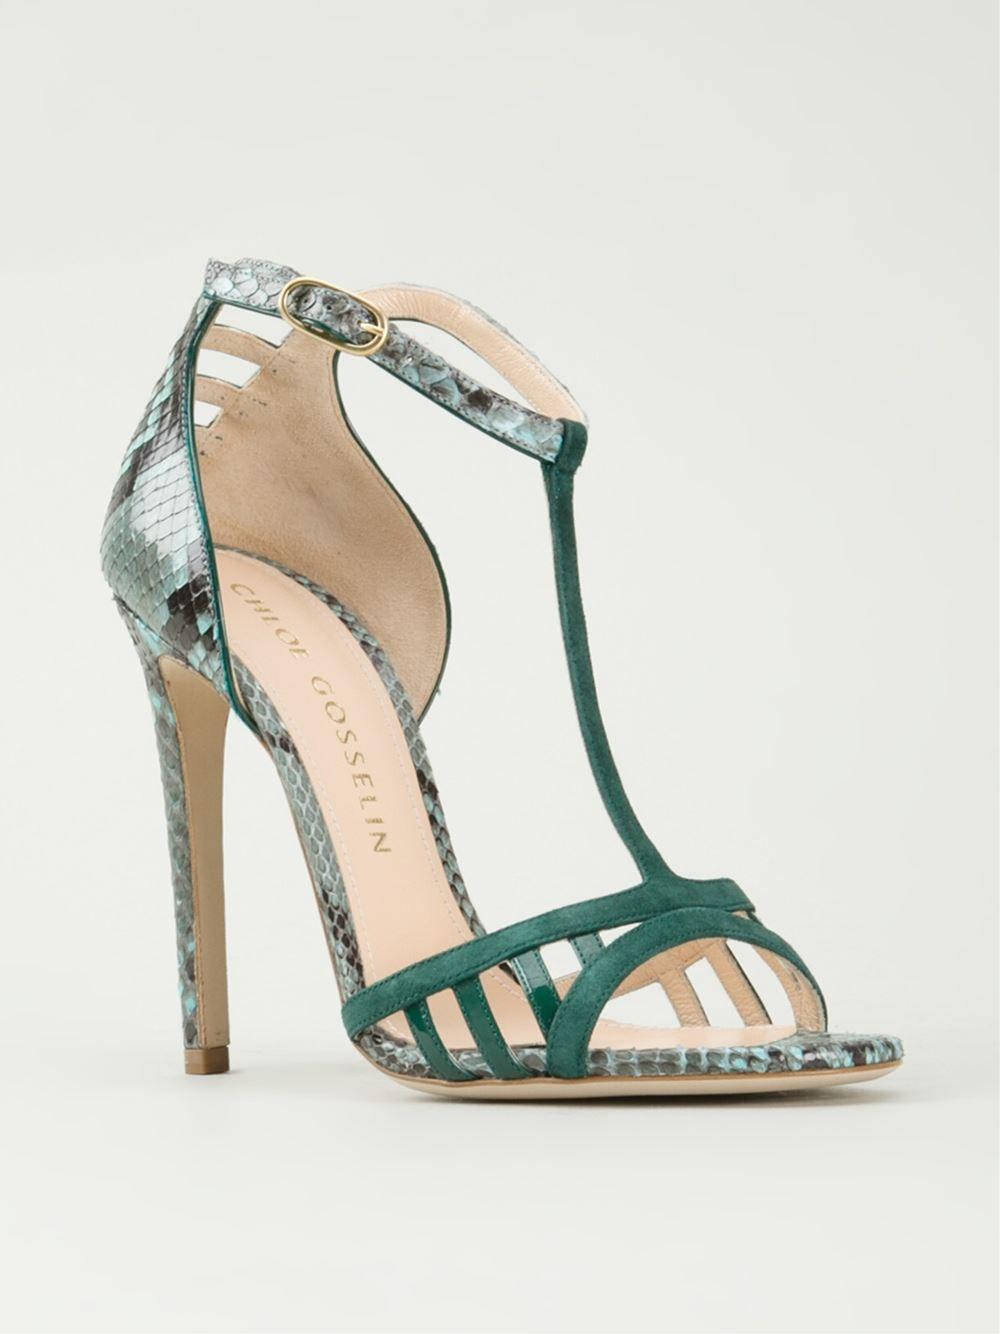 Image result for chloe gosselin shoes